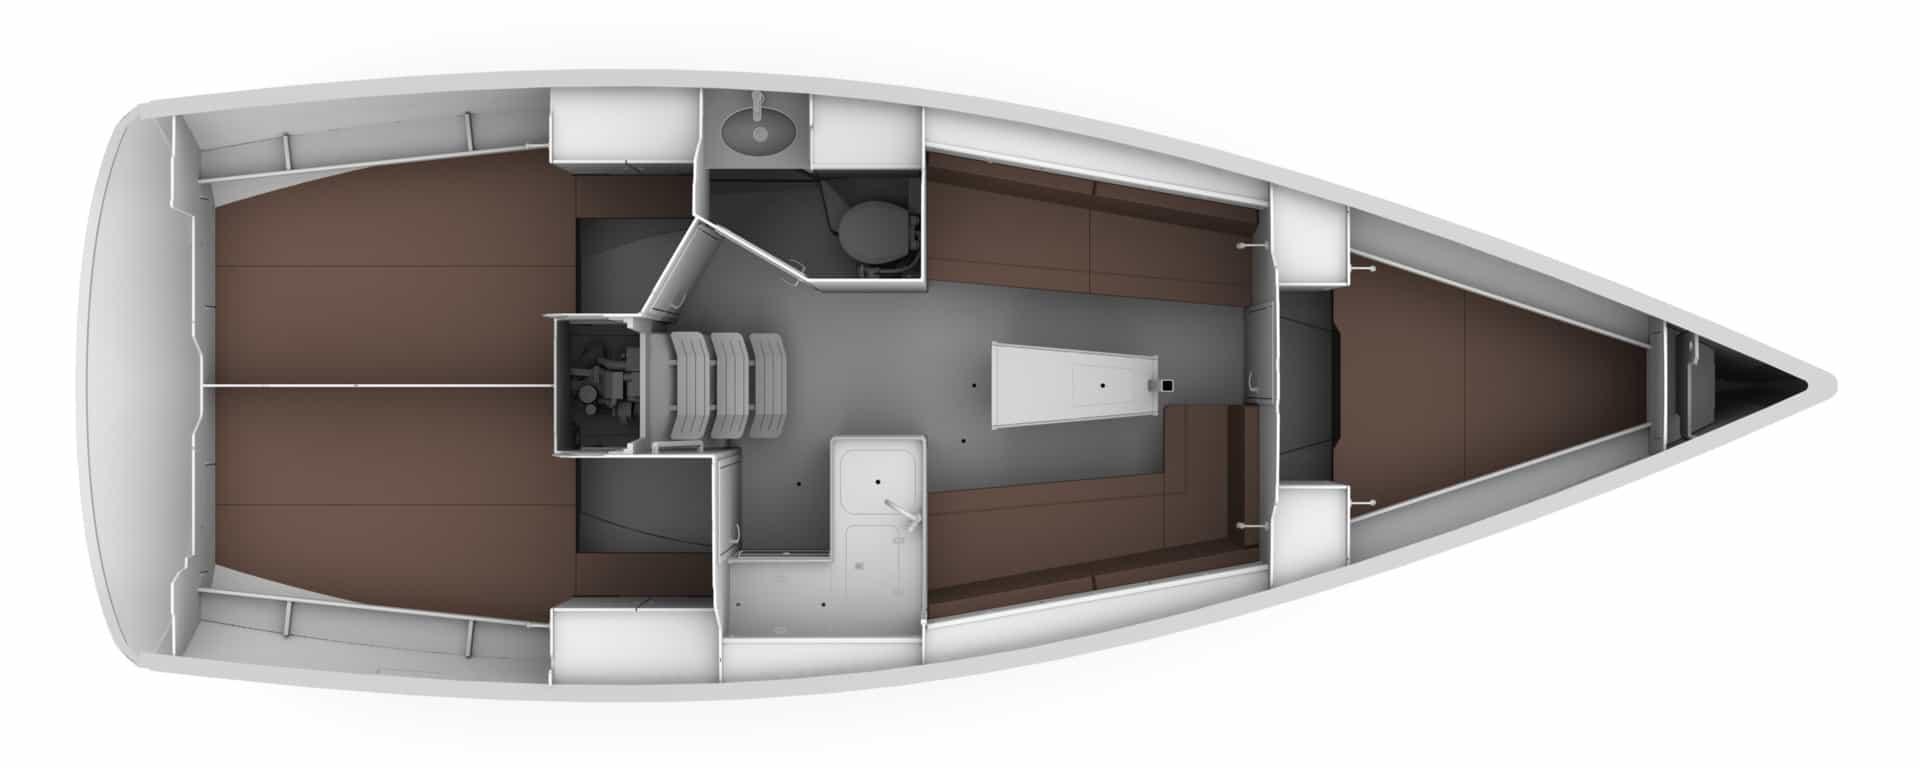 Bavaria Cruiser 34 layout